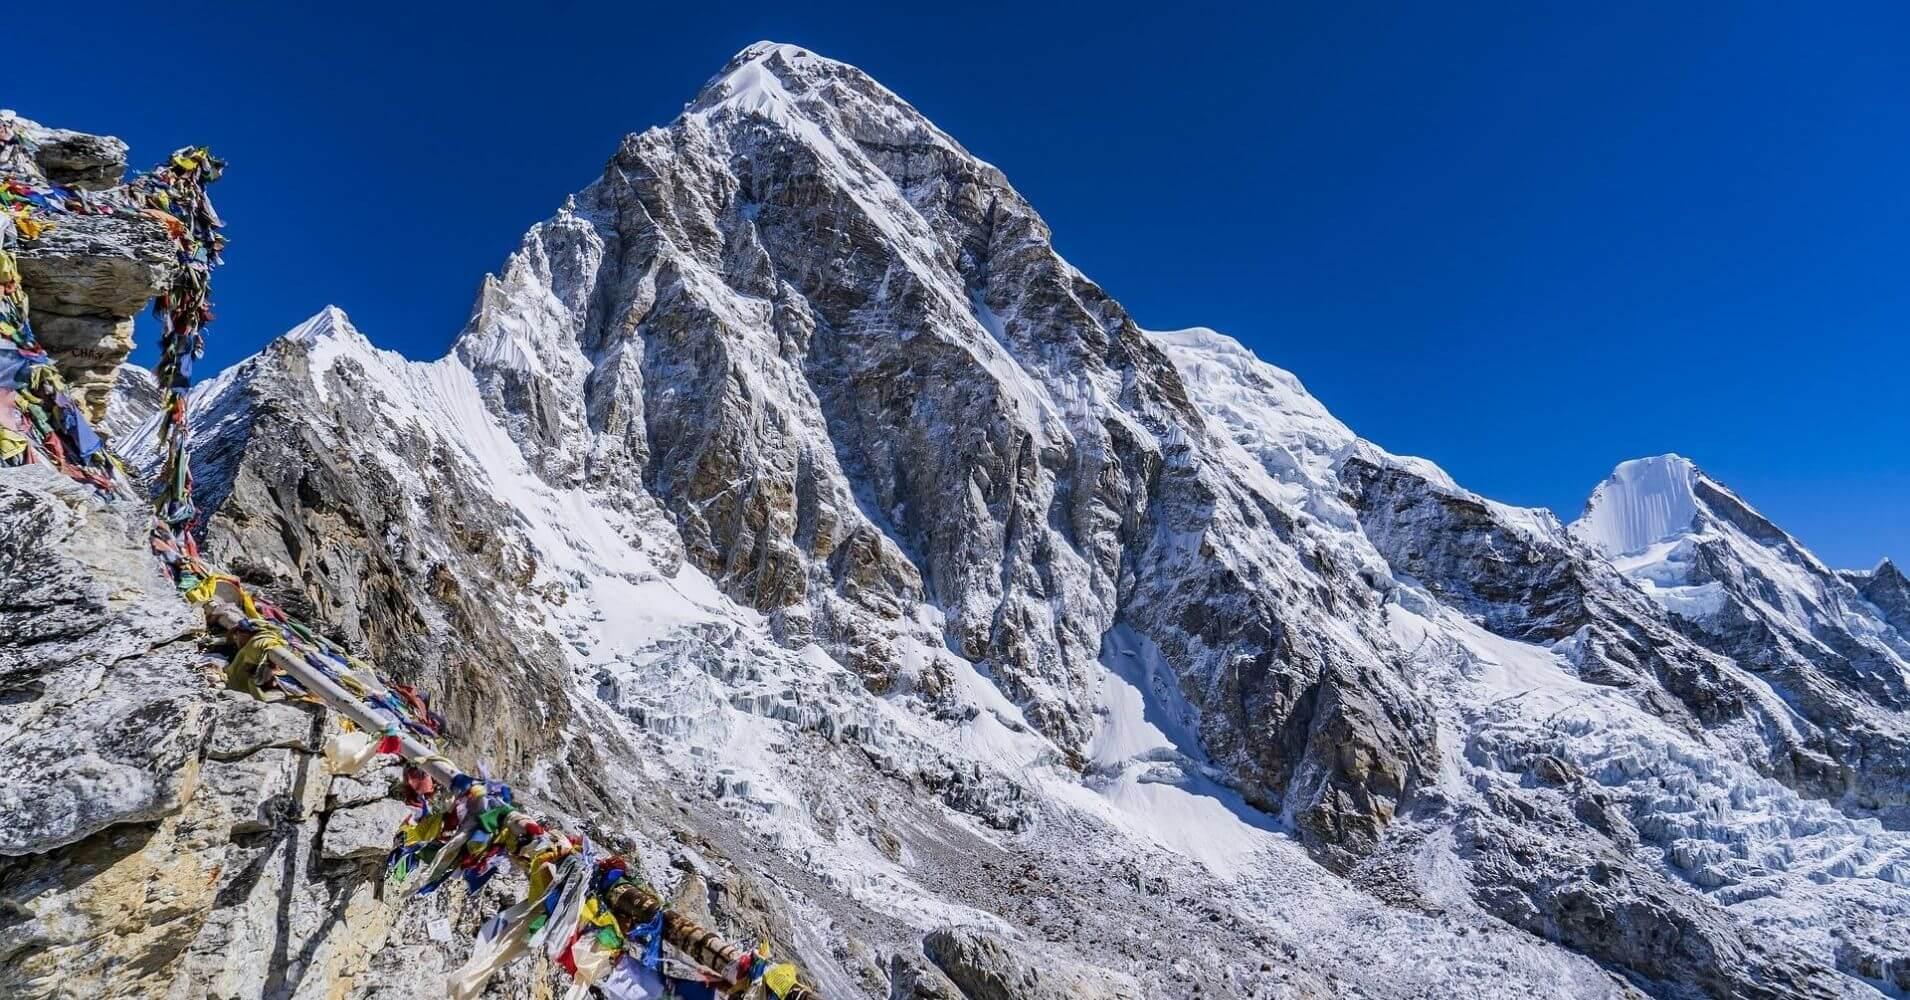 Cordillera del Himalaya. Nepal. Asia.